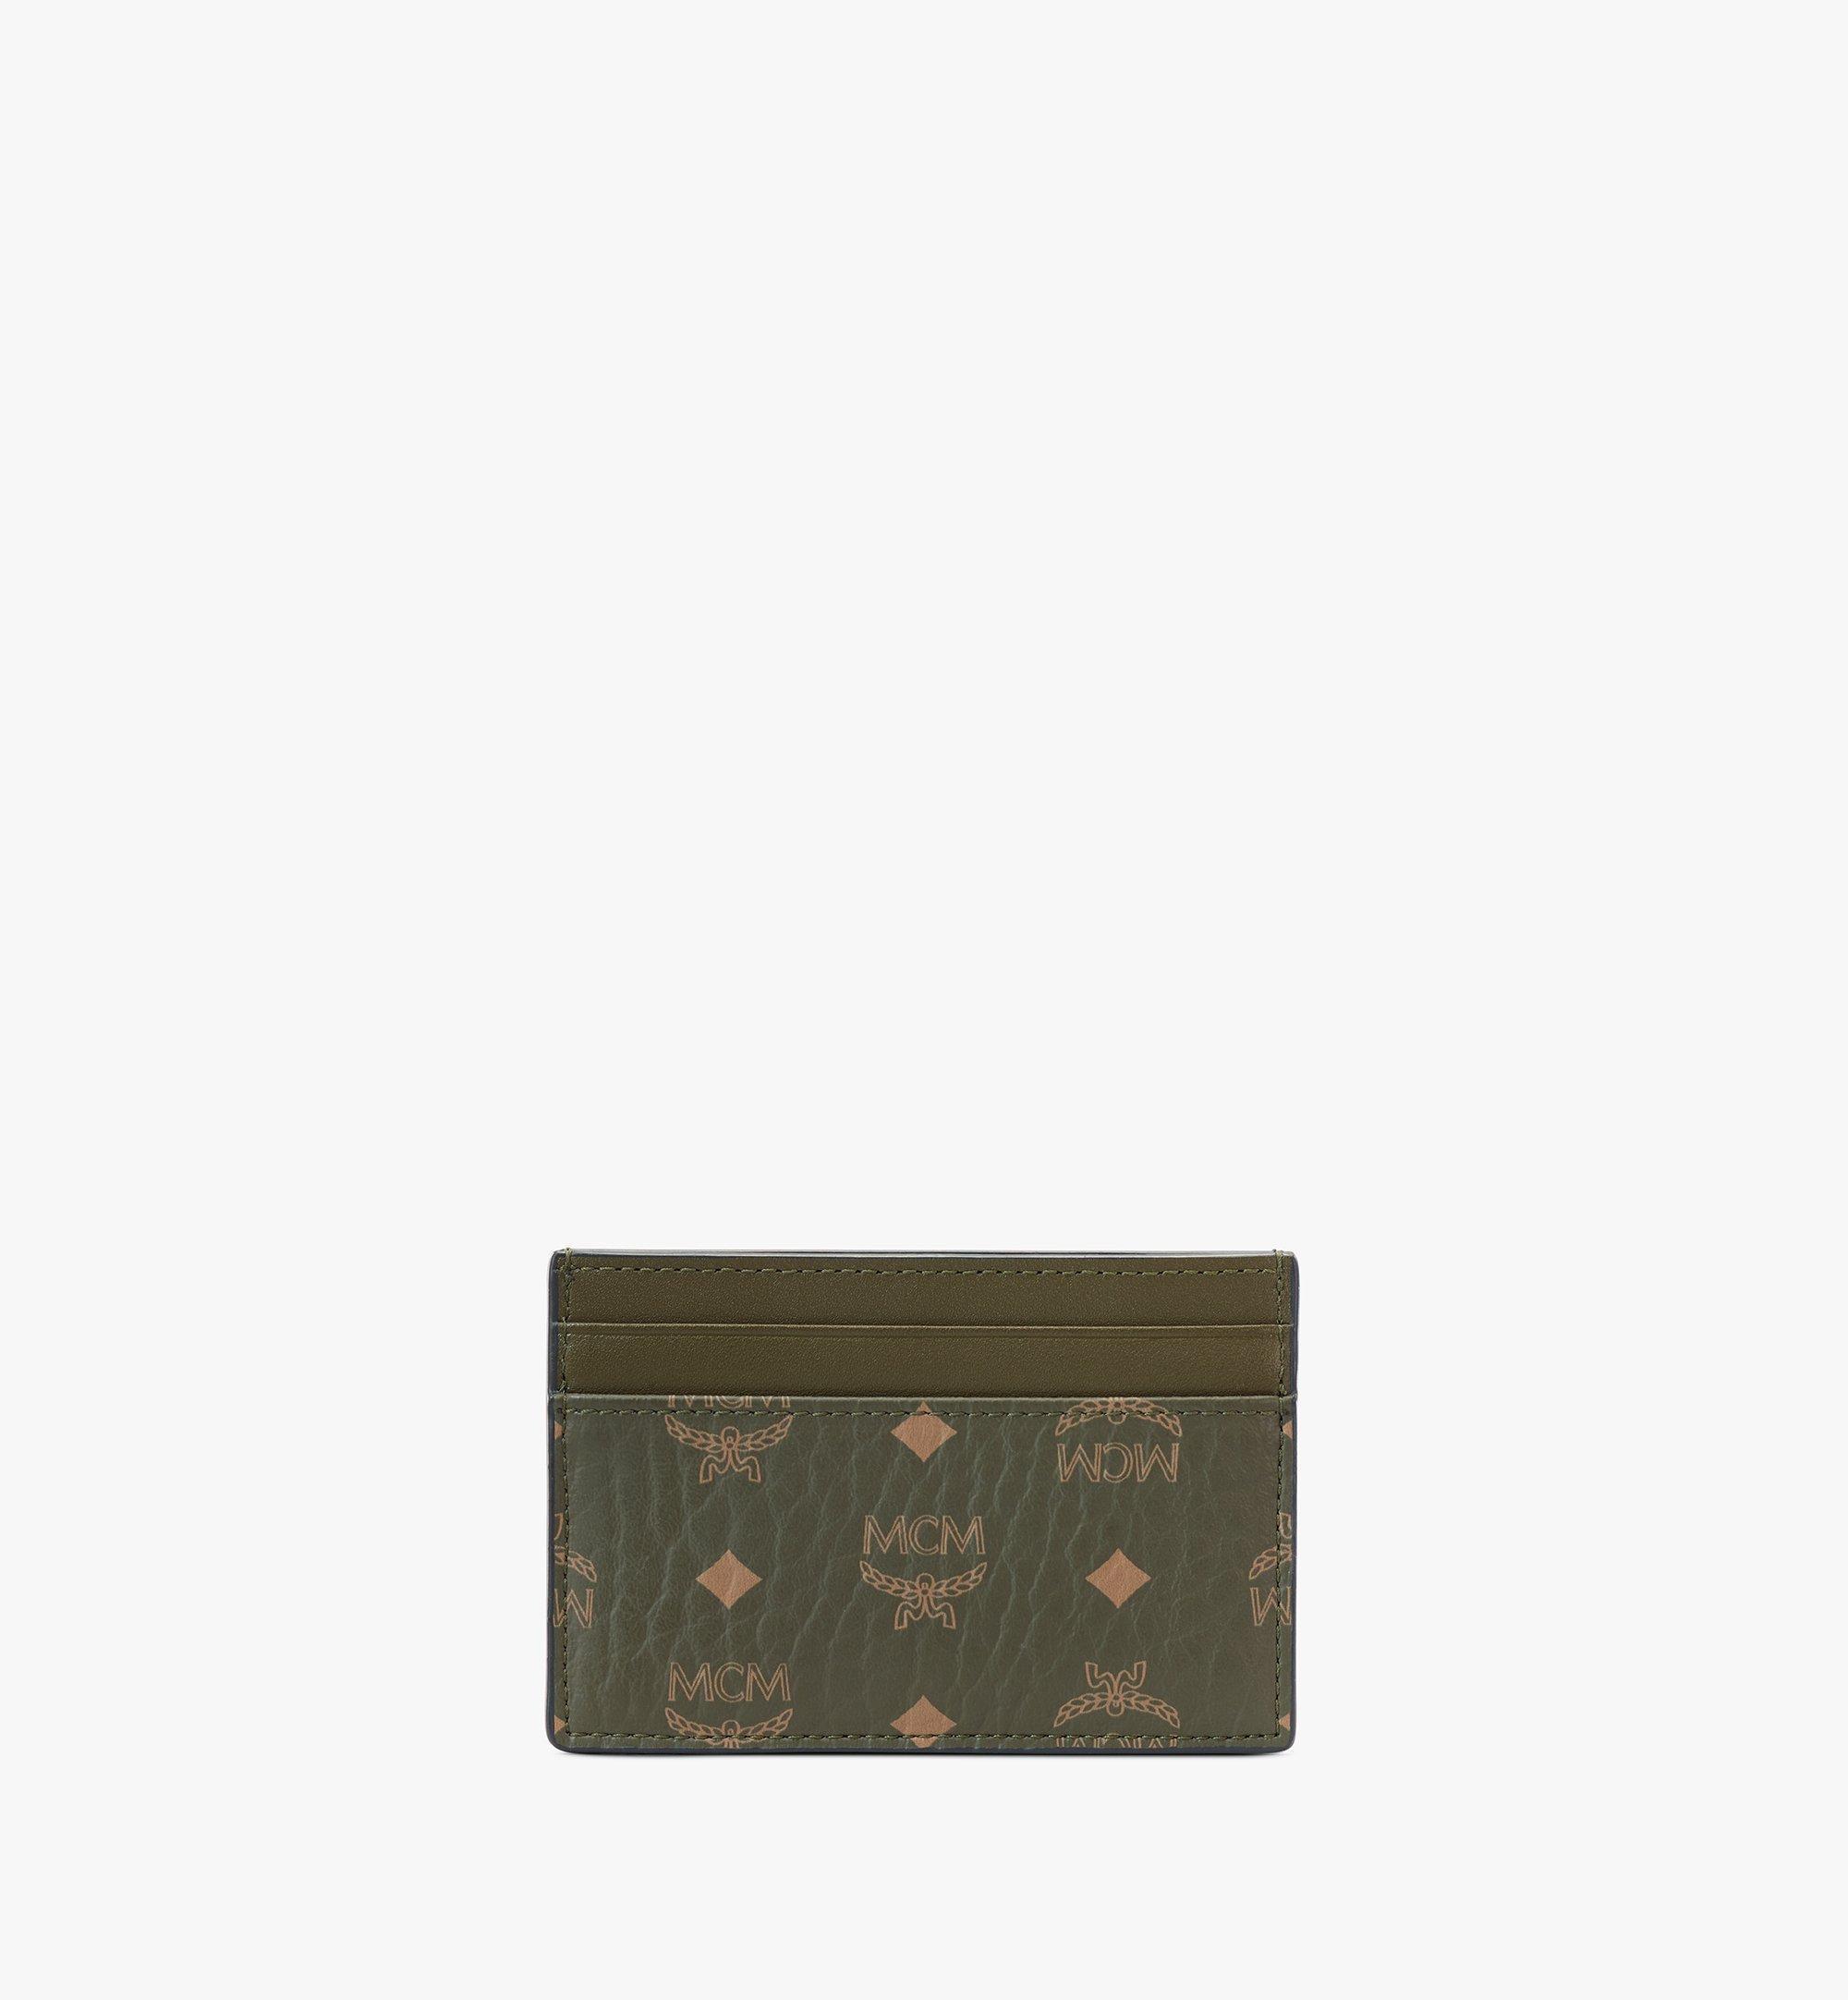 MCM Card Case in Visetos Original Green MXAAAVI01JH001 Alternate View 1